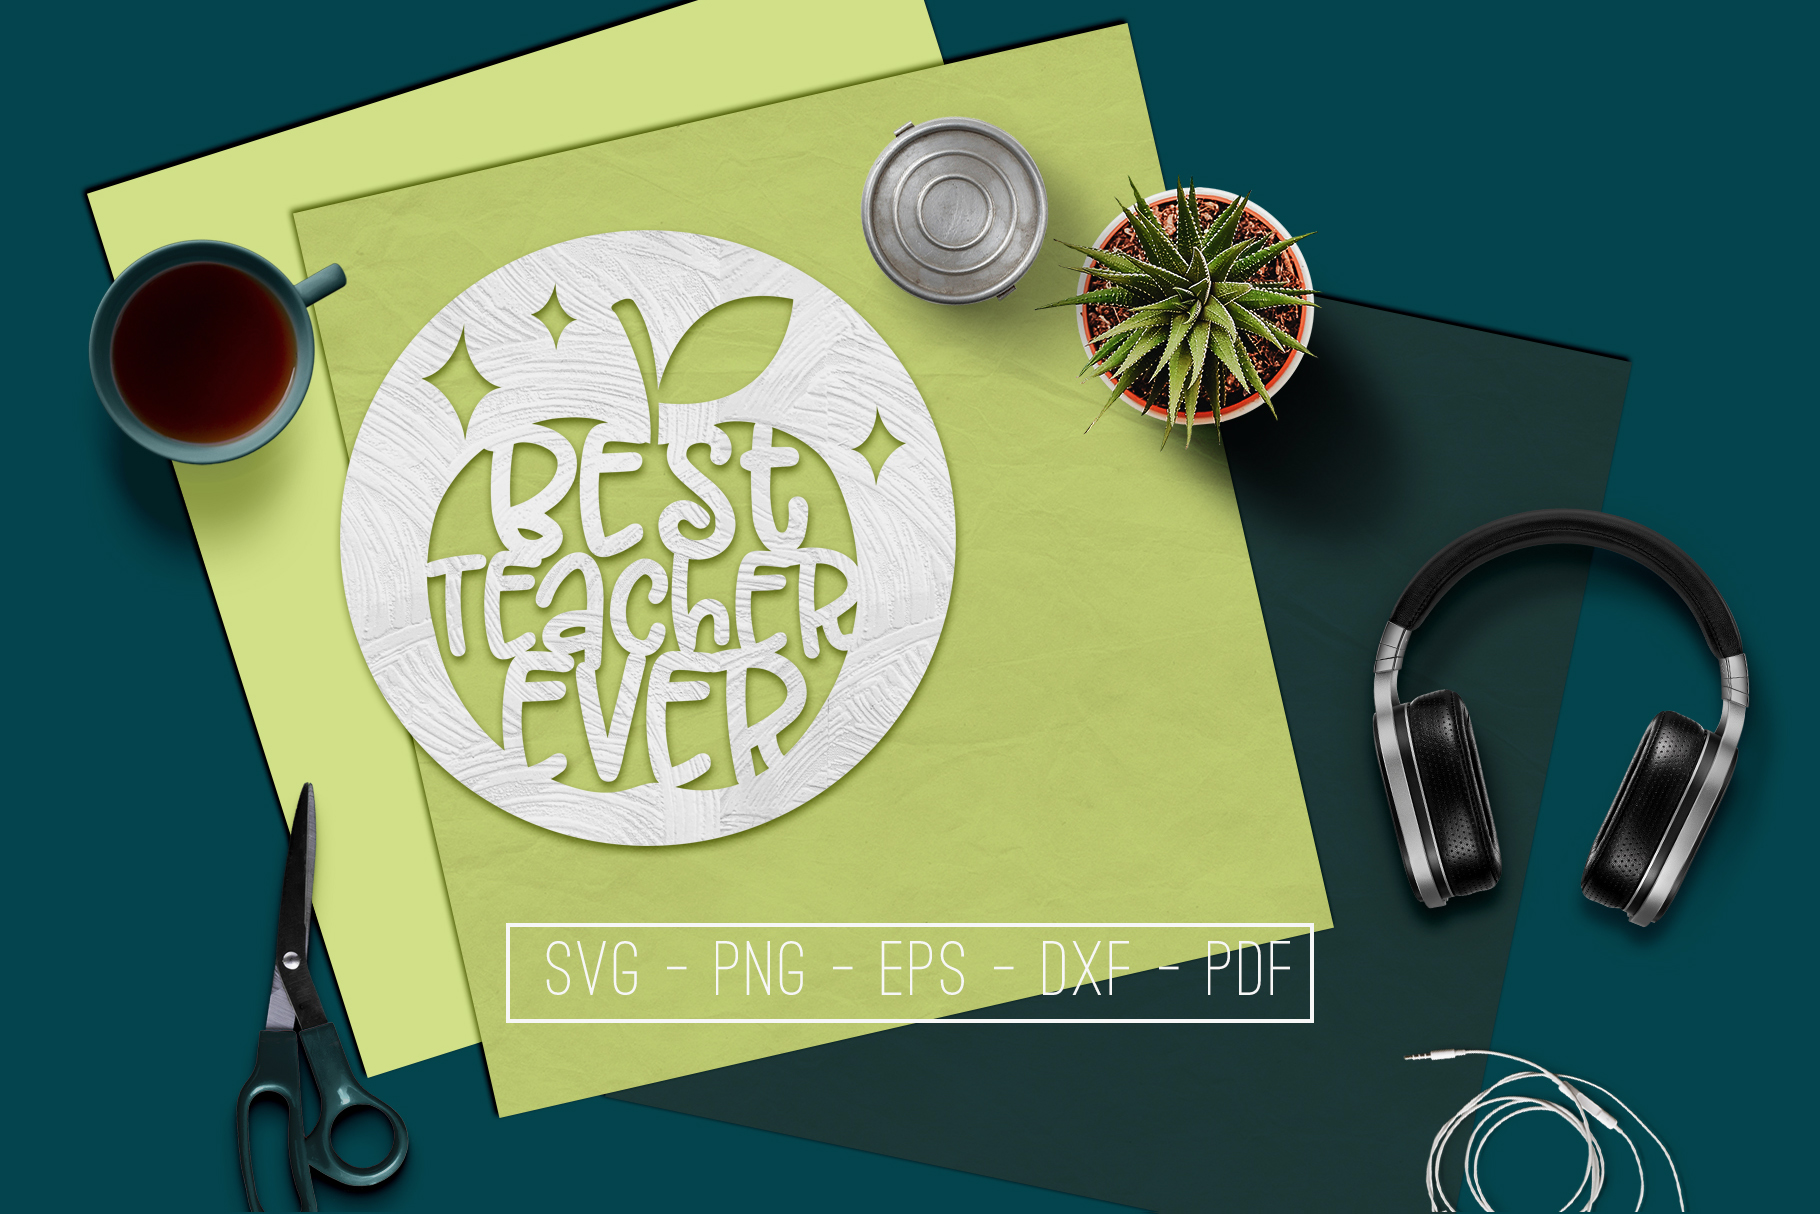 Best Teacher Ever Paper Cut Template, School SVG, PDF, DXF example image 1